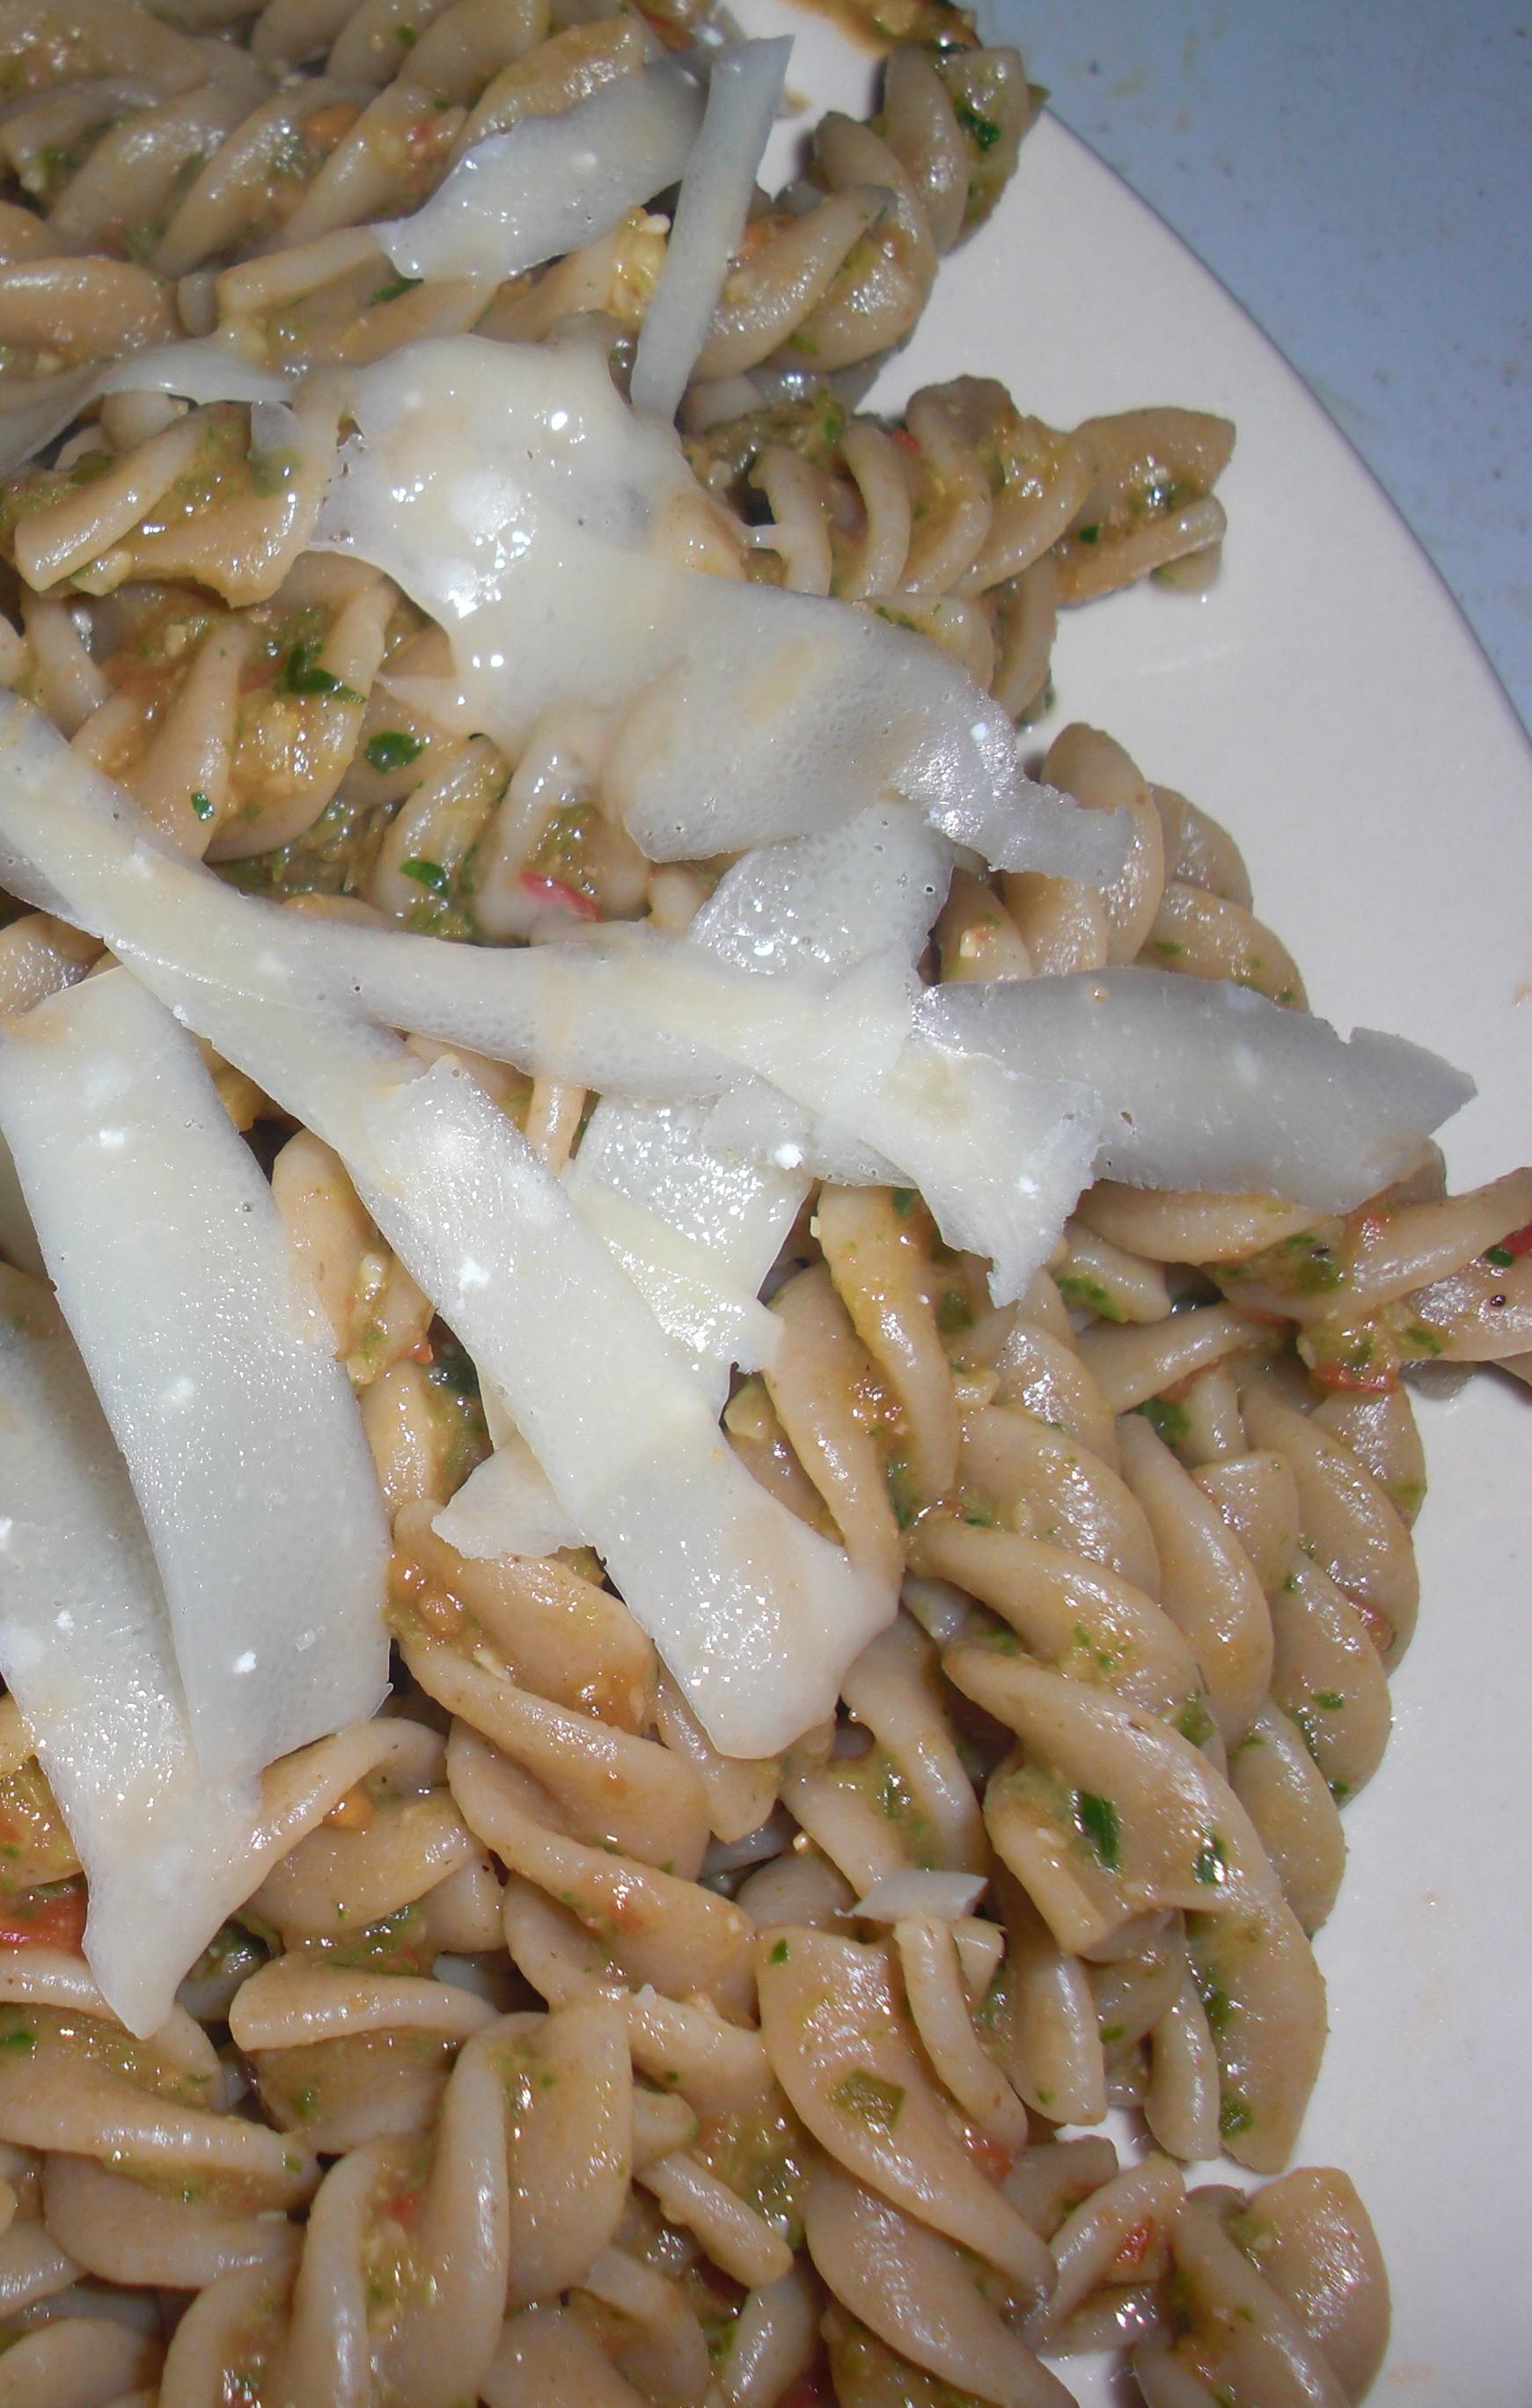 Sorrel pesto with whole wheat rigatoni